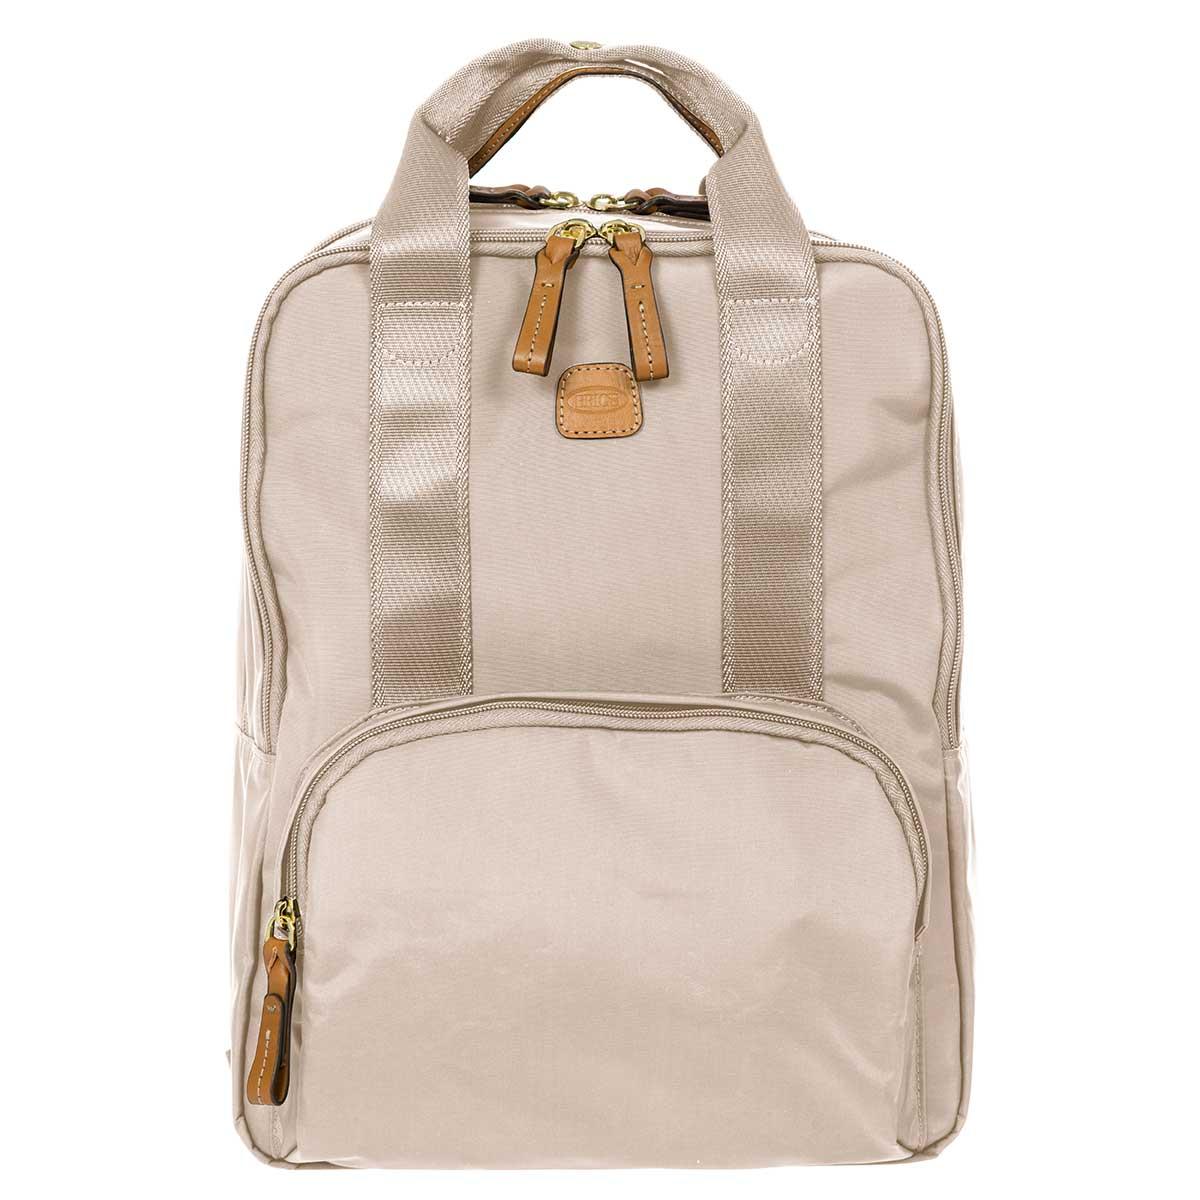 X-Bag Urban Backpack - Papyrus   Brics store luggage